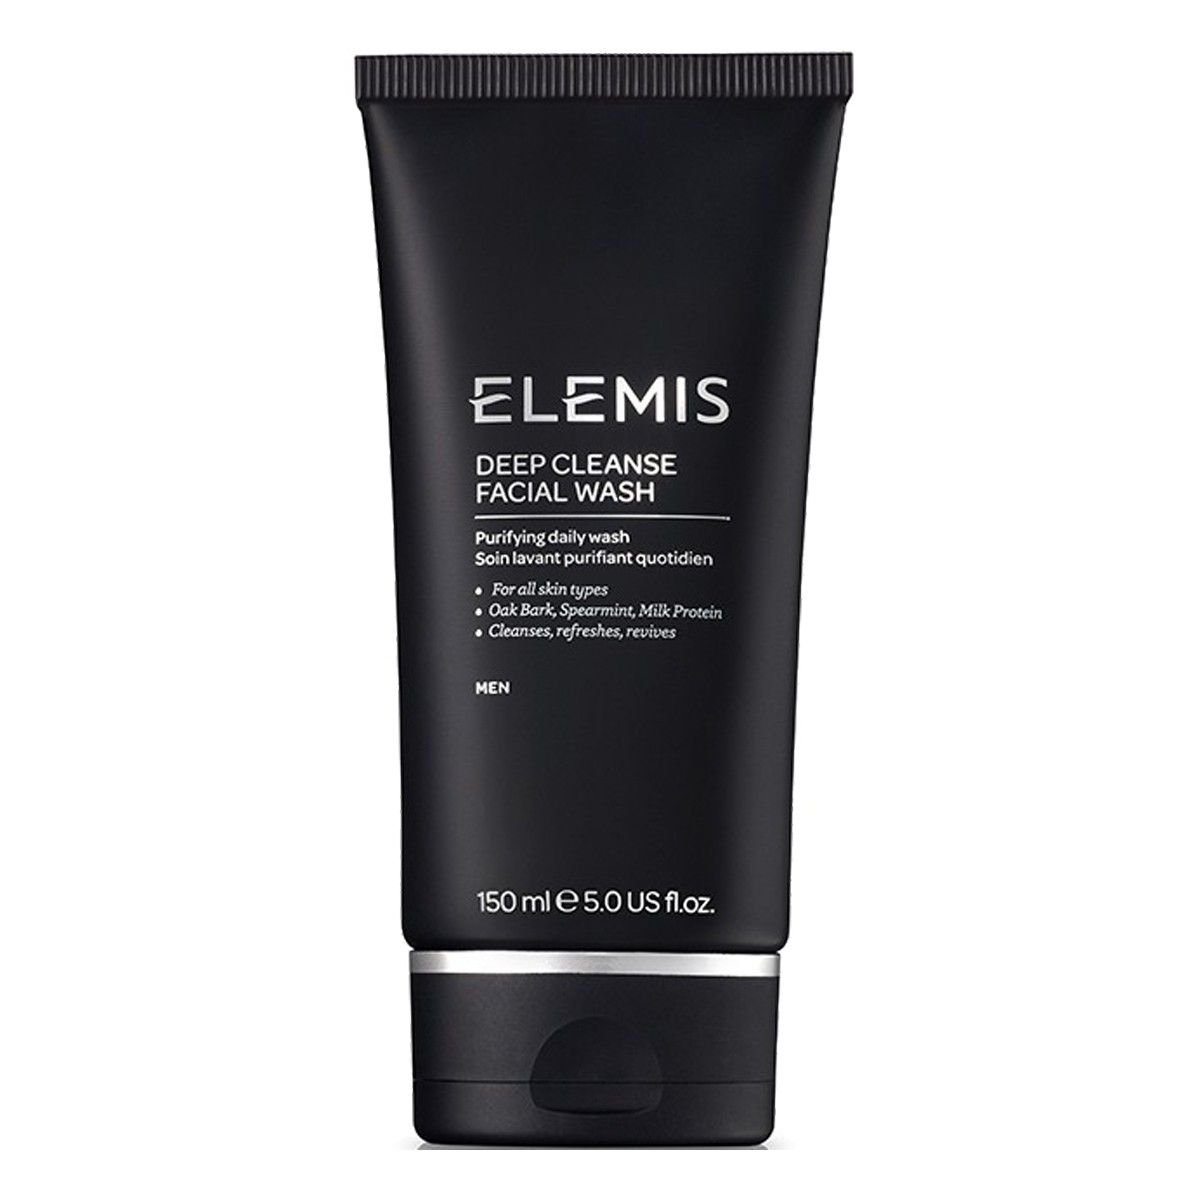 Afbeelding van Elemis Deep Cleanse Facial Wash Men Skincare Beauty